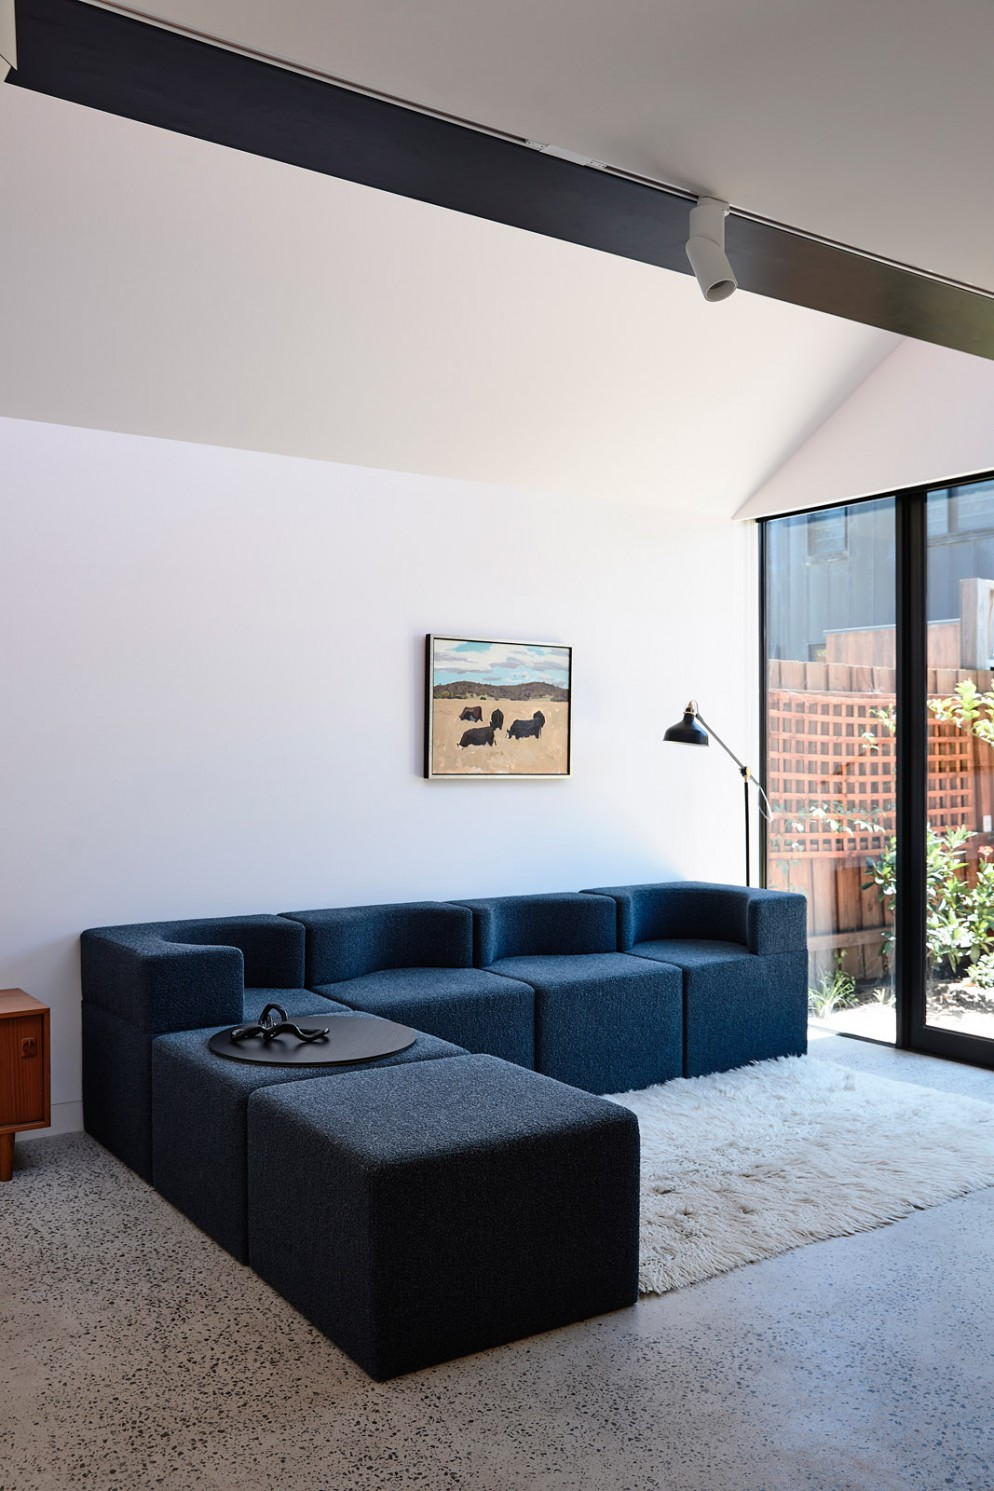 10 AMA-Terracotta_House_Derek_Swalwell